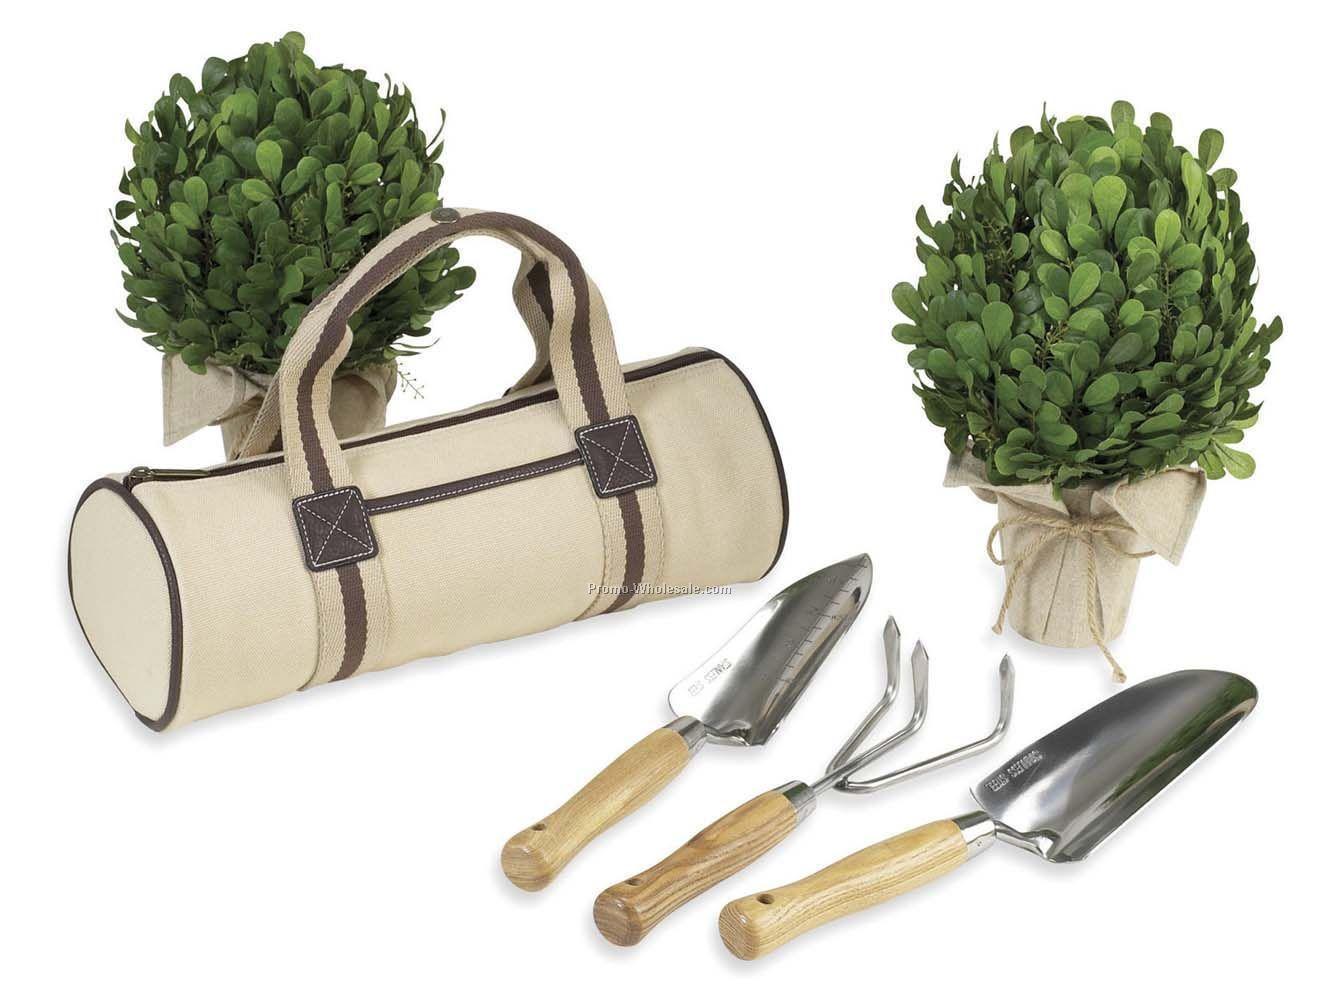 childrens garden tools set. Children\u0027s Garden Tool Set \u003e\u003e\u003e You Can Find Out More Details At The Link Childrens Tools